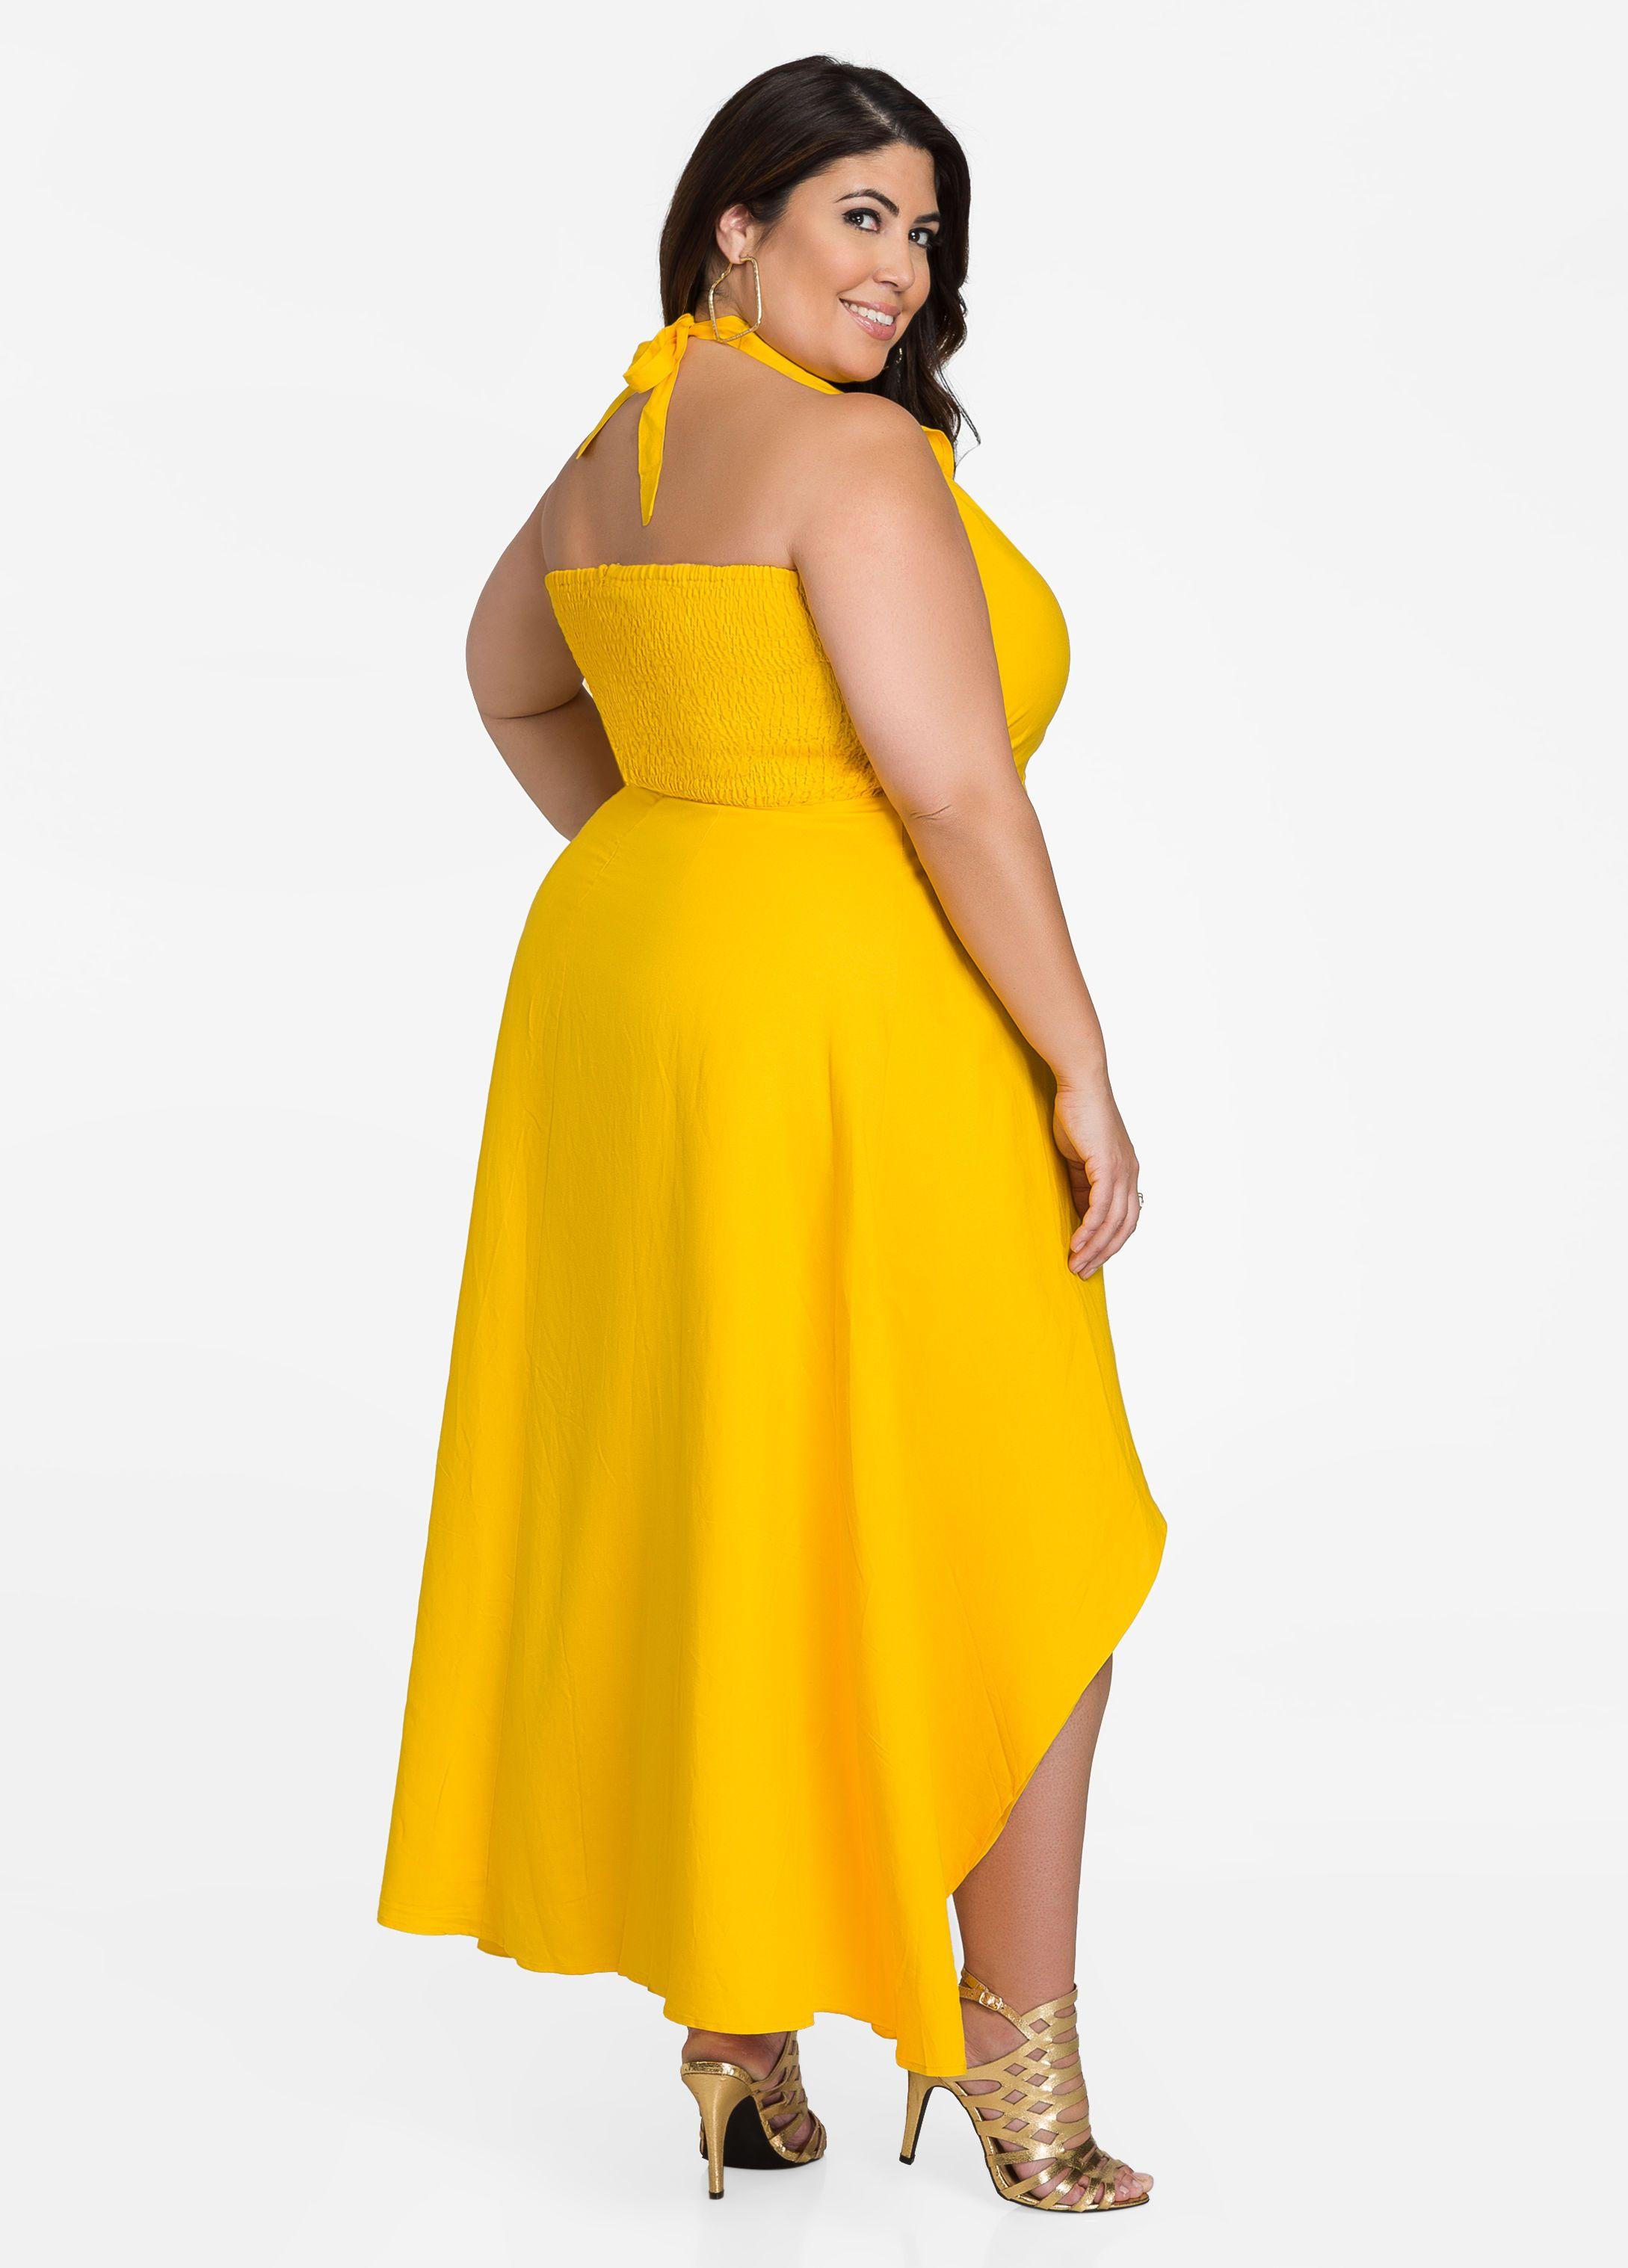 bf83dfdee8e1c Ruffle Top Hi-Lo Halter Maxi Dress - Ashley Stewart